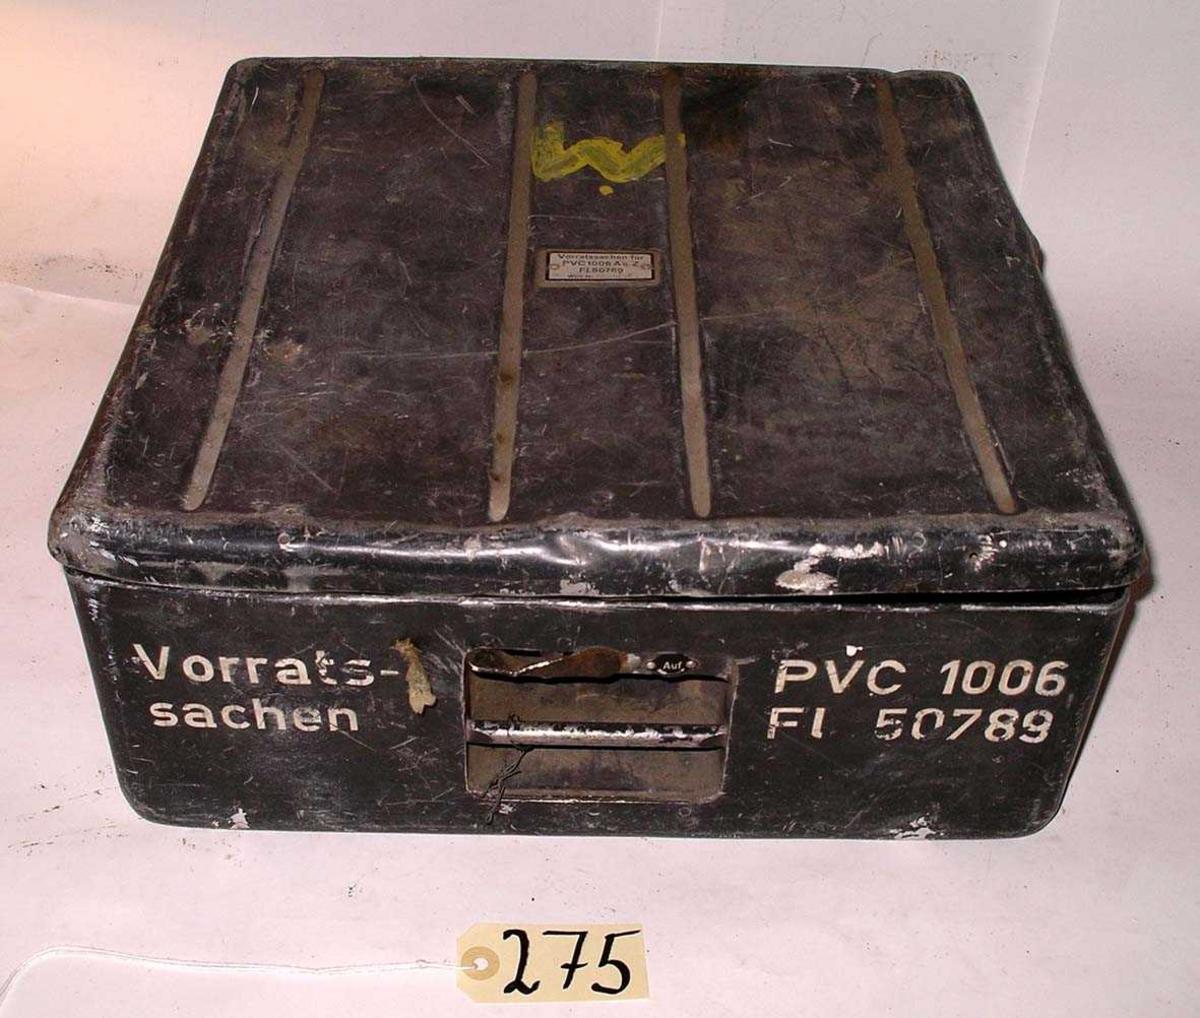 "Påført merking ""Vorrats sachen PVC 1006 FL. 50789"""